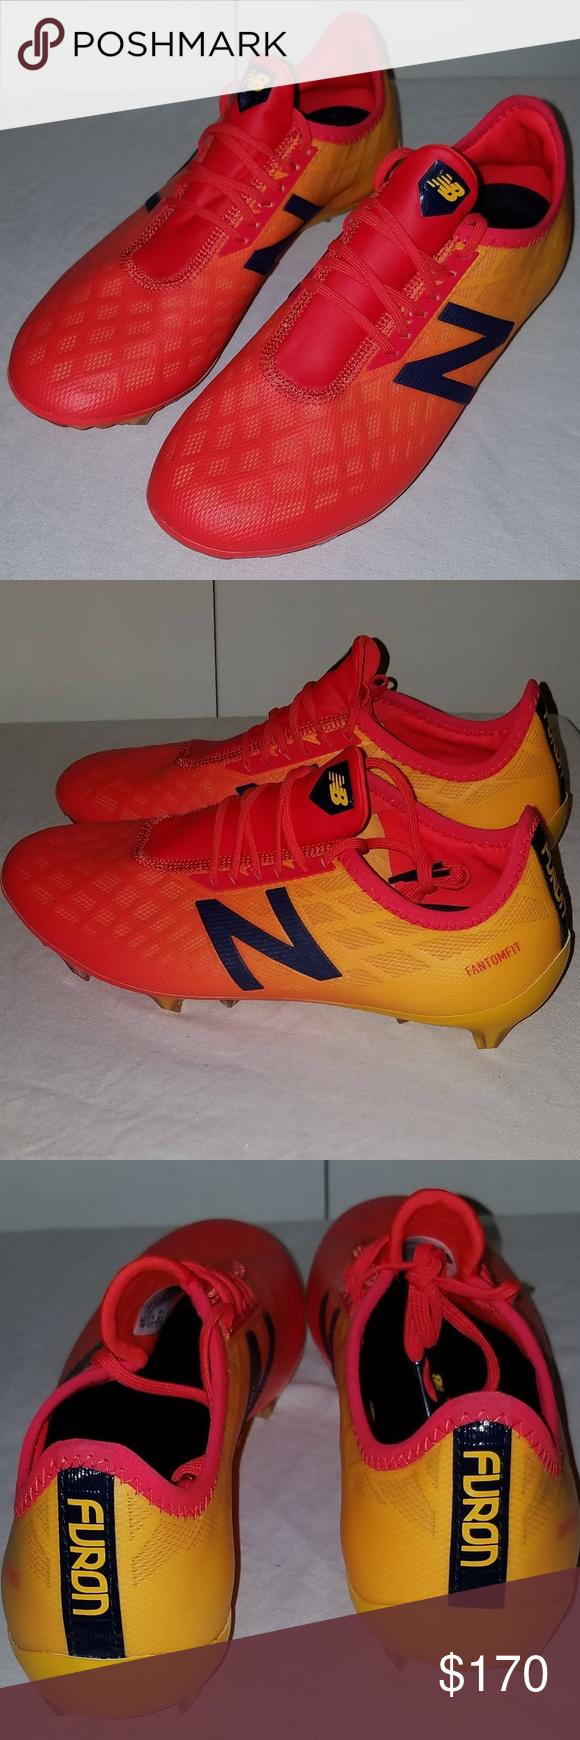 New Balance Furon 4 0 Pro Fg Soccer Cleats 6 5 Baseball Shoes Baseball Cleats New Balance Shoes